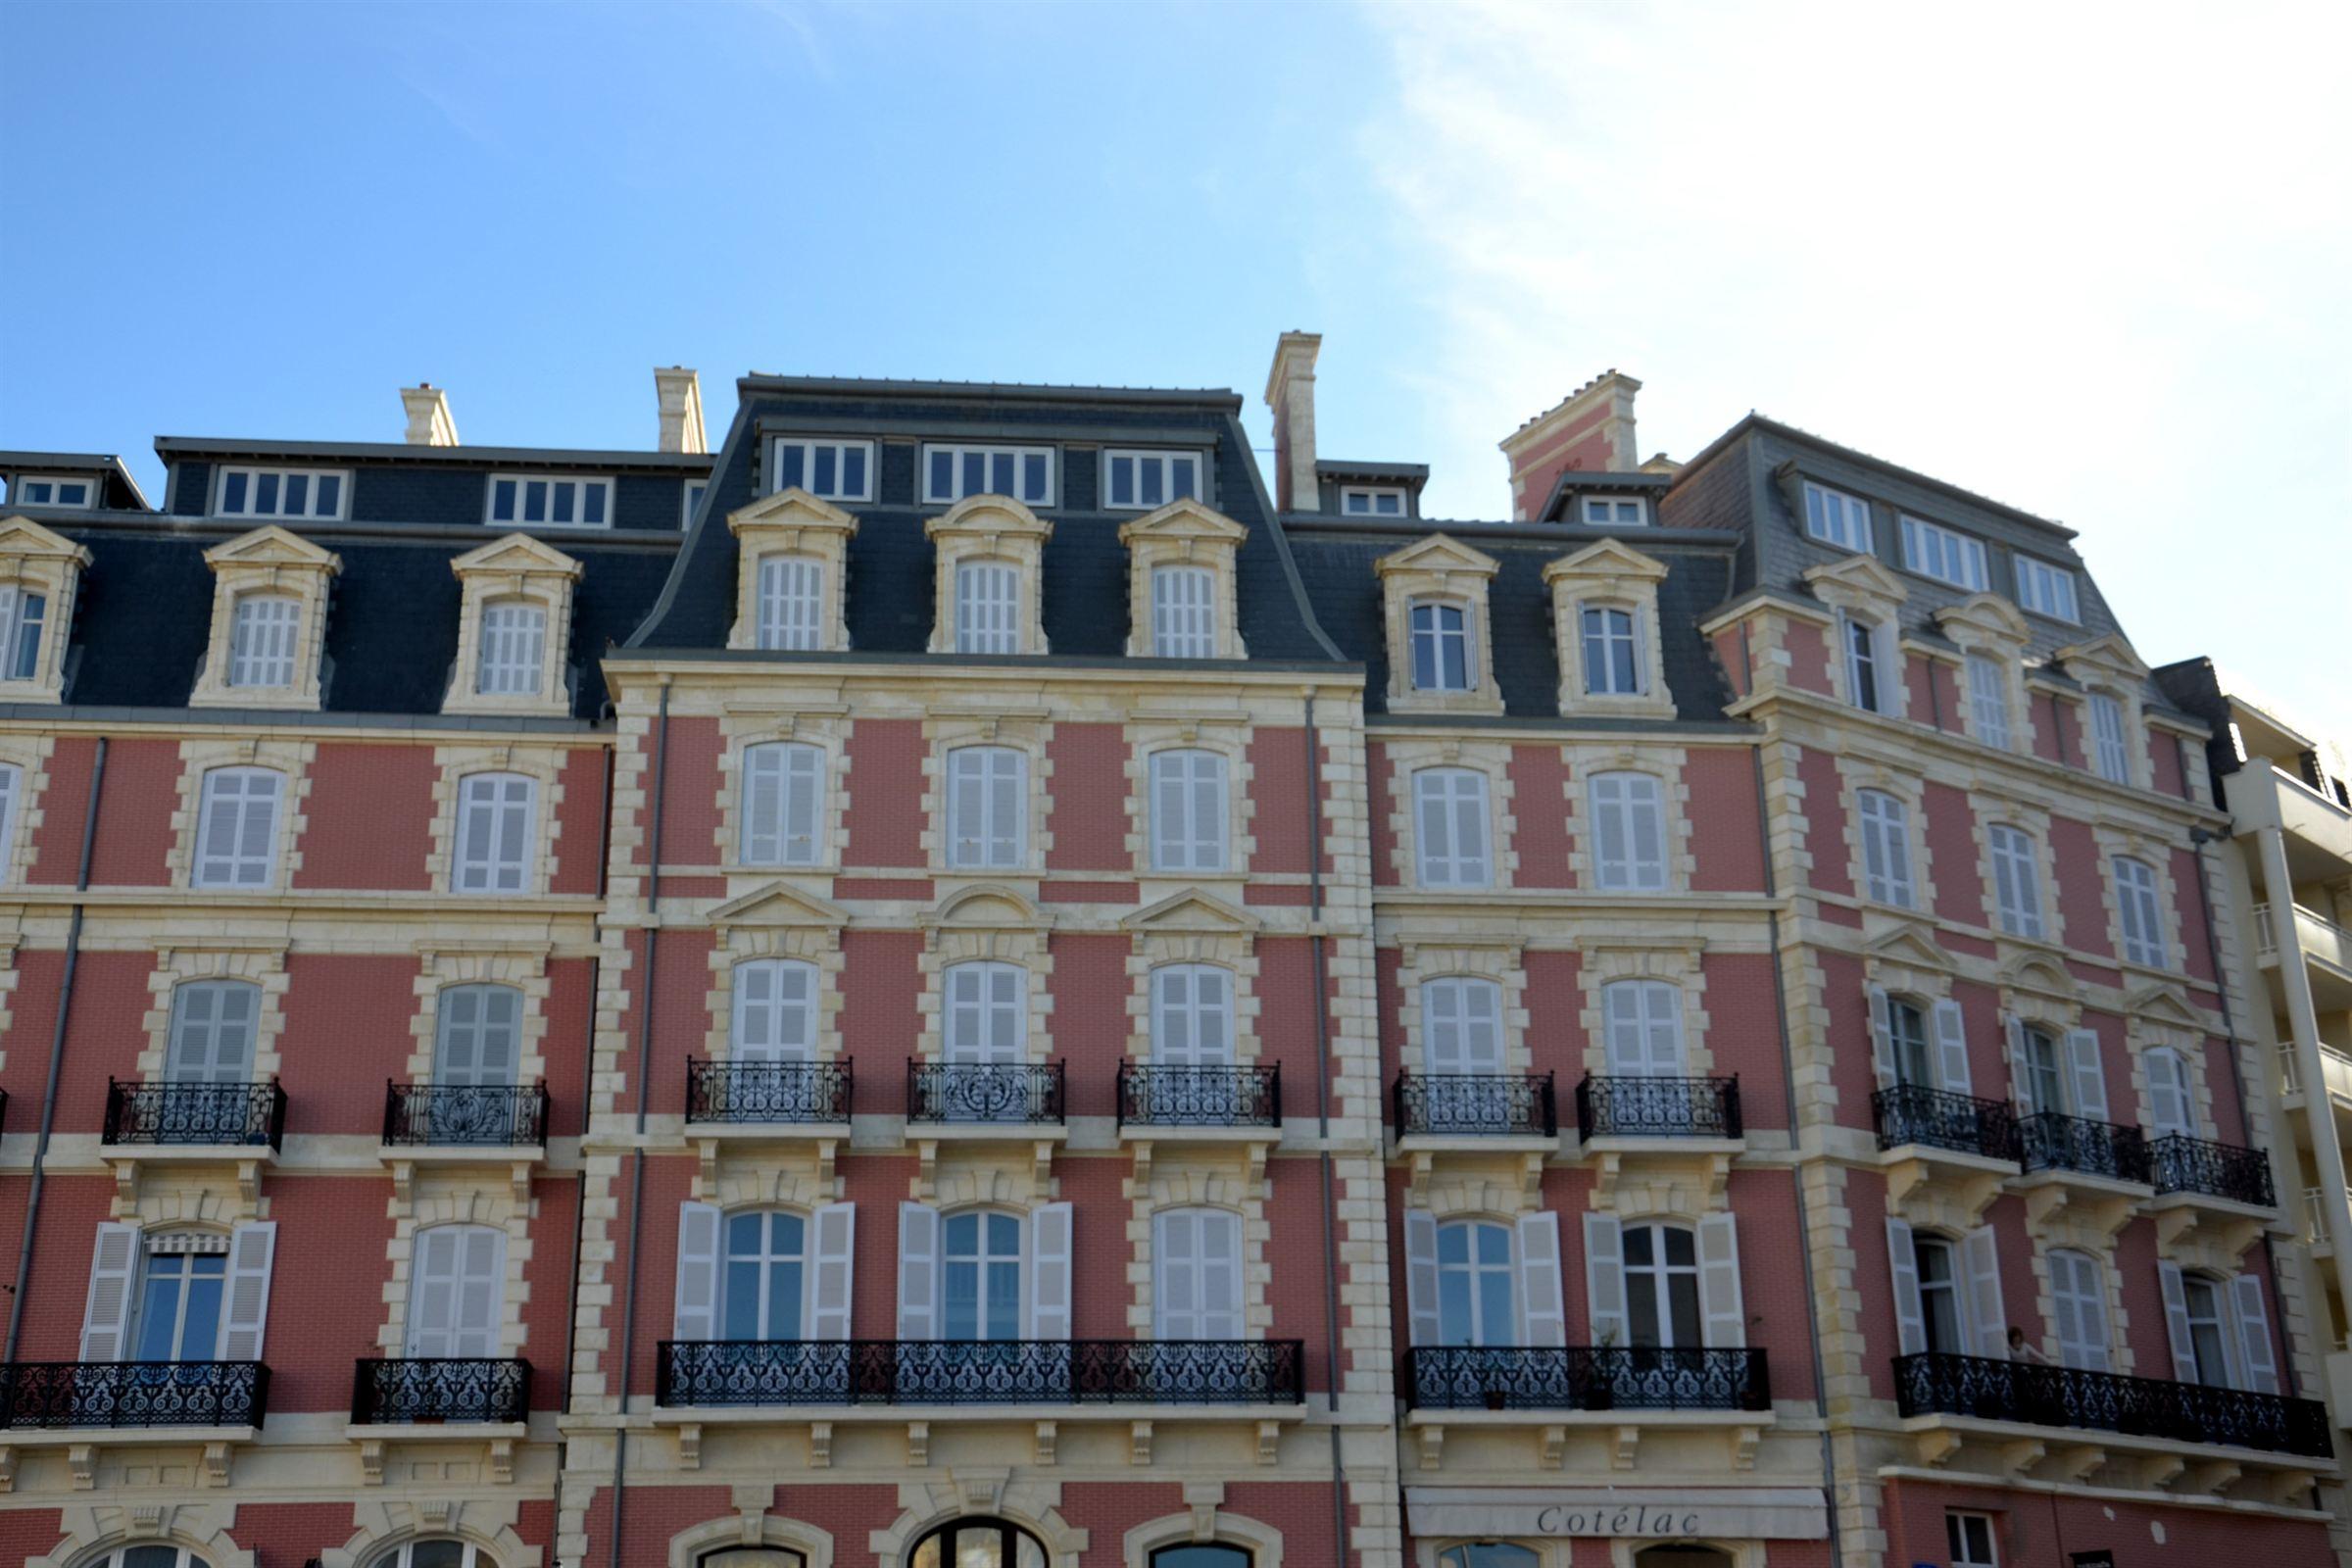 Appartamento per Vendita alle ore BIARRITZ CENTRE Biarritz, Aquitania, 64200 Francia